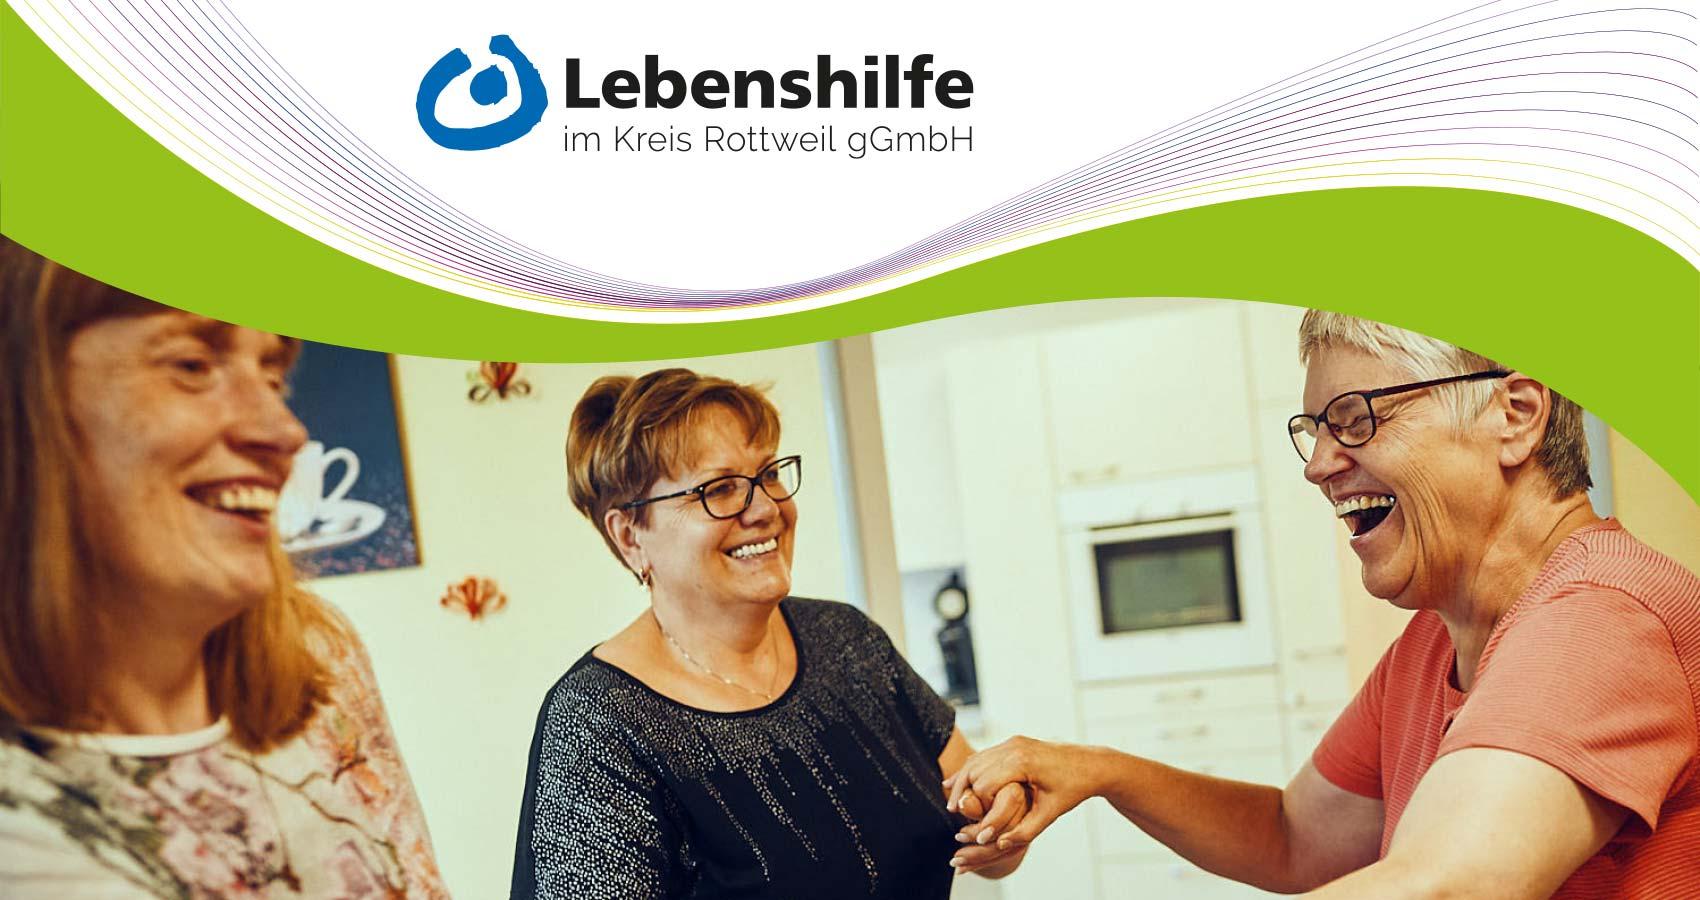 Lebenshilfe im Kreis Rottweil gGmbH - Freizeitangebot - Kurse